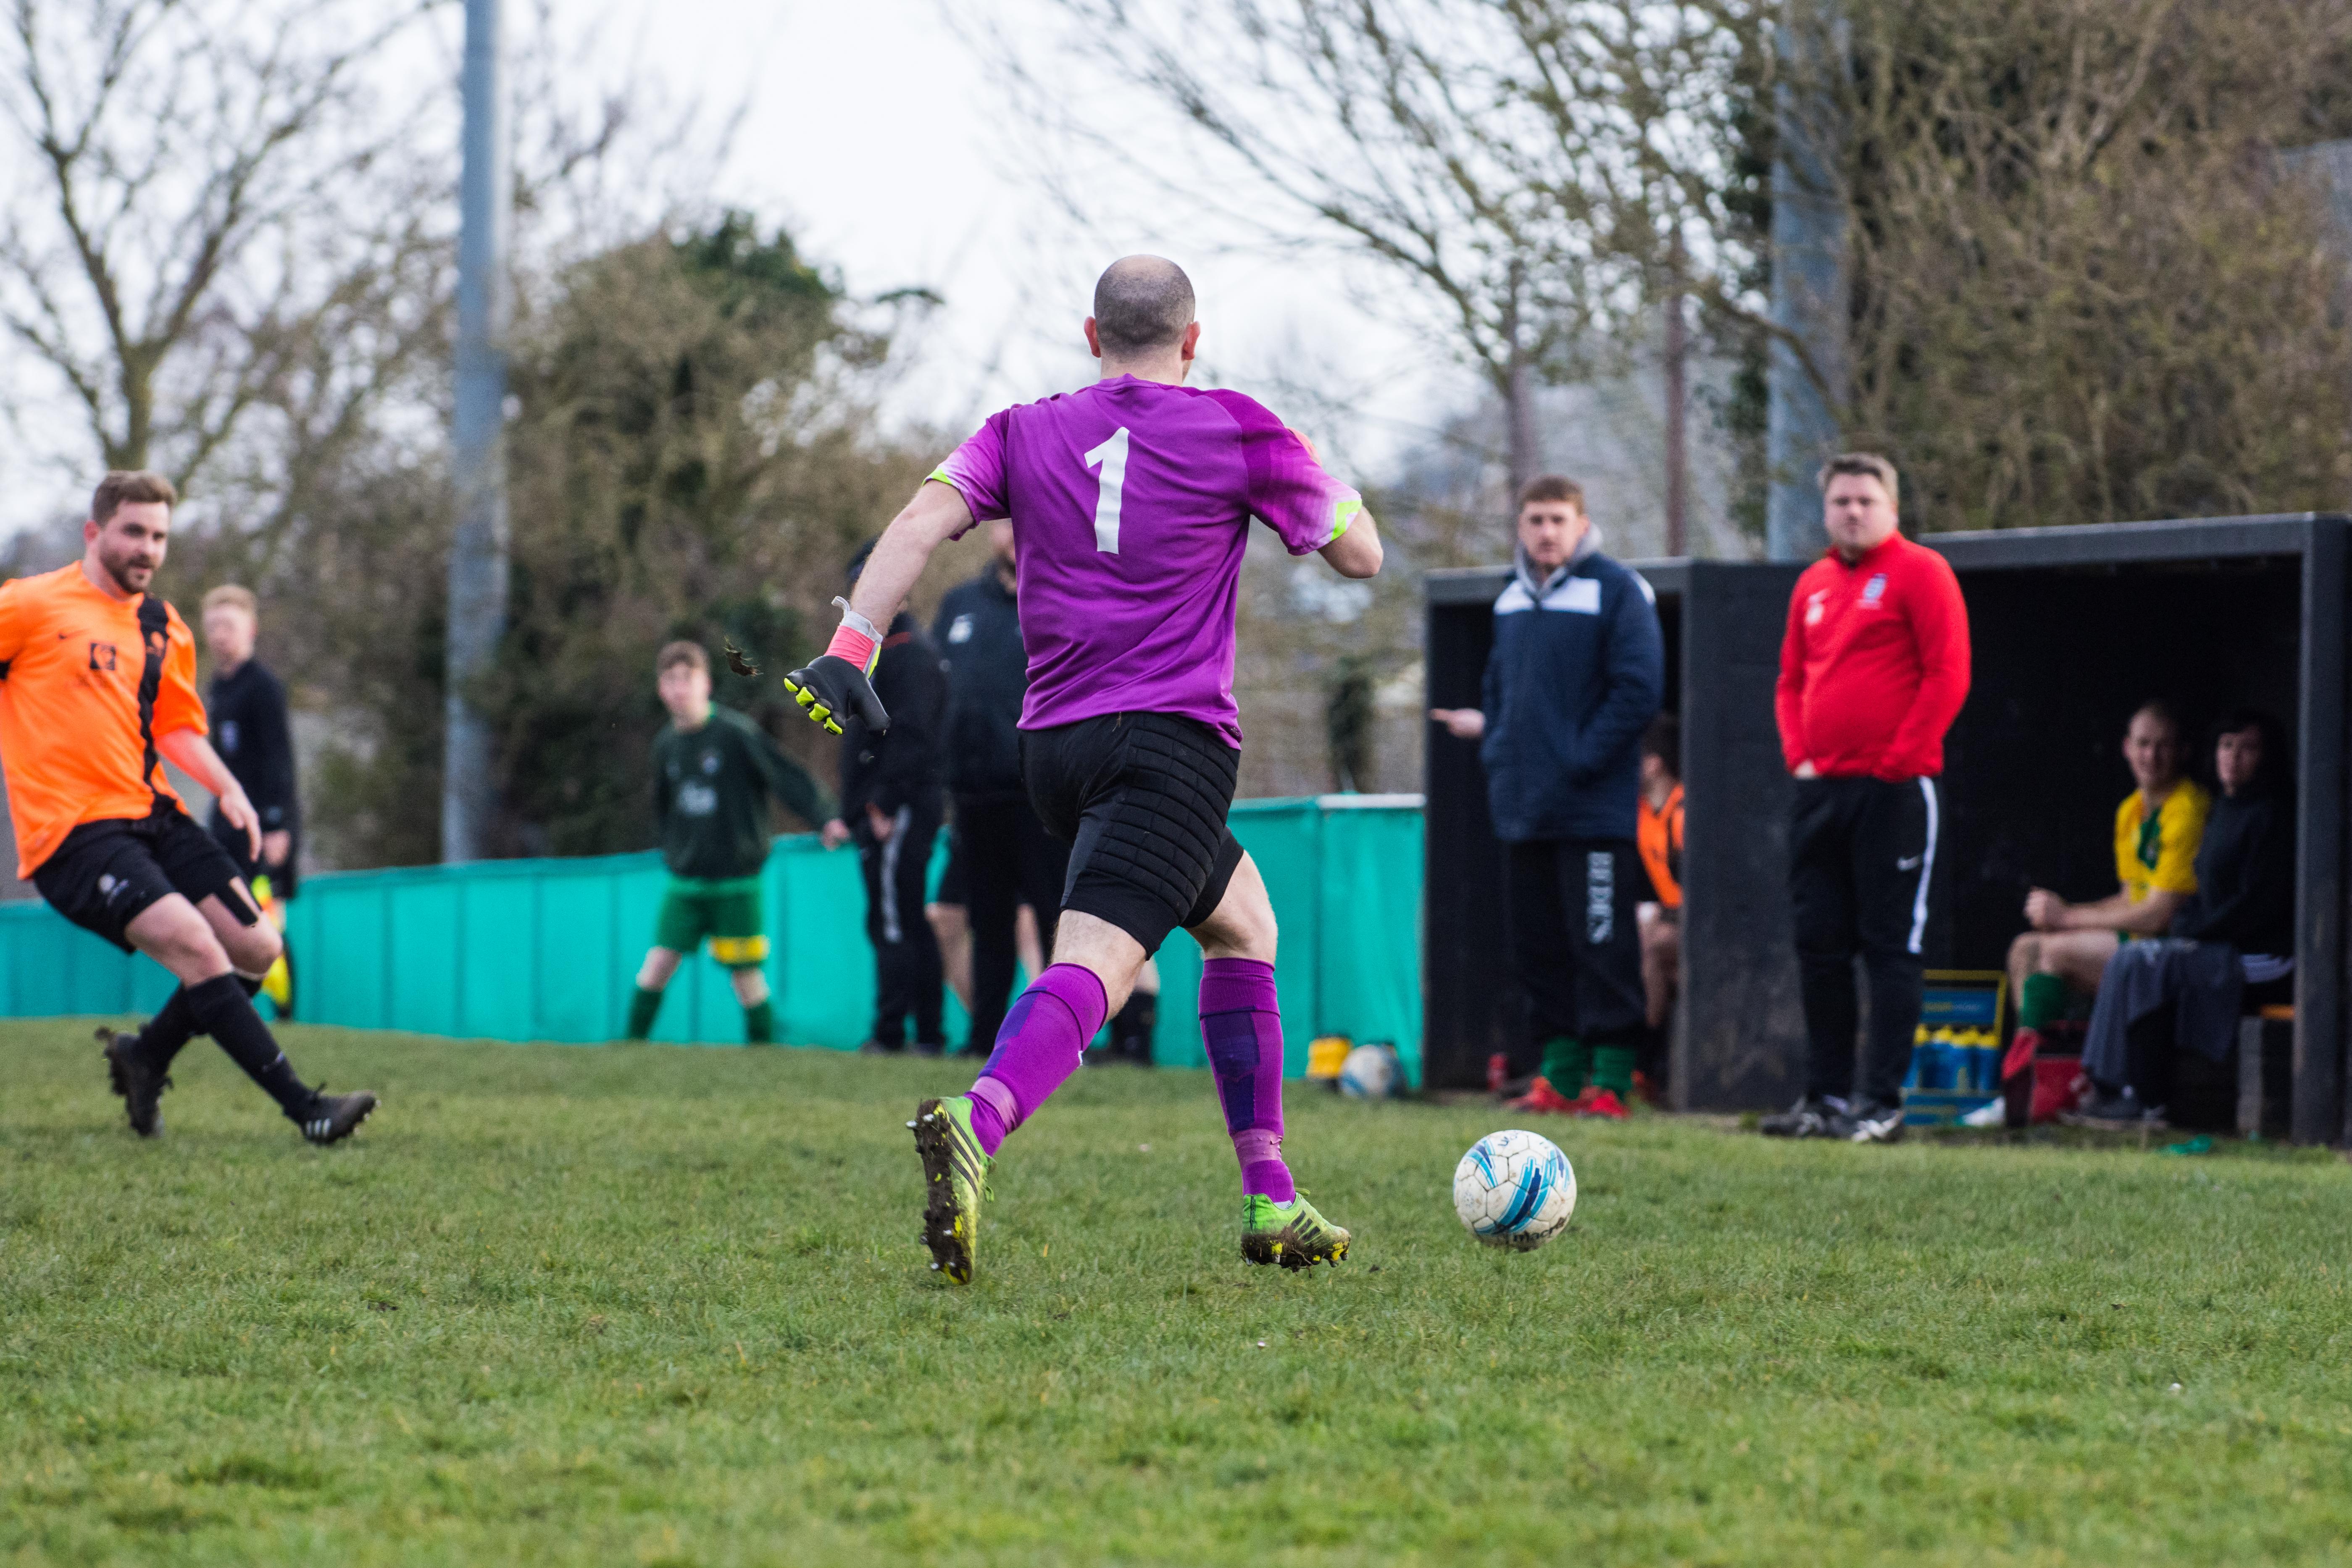 DAVID_JEFFERY Mile Oak FC vs Hailsham Town FC 24.03.18 86